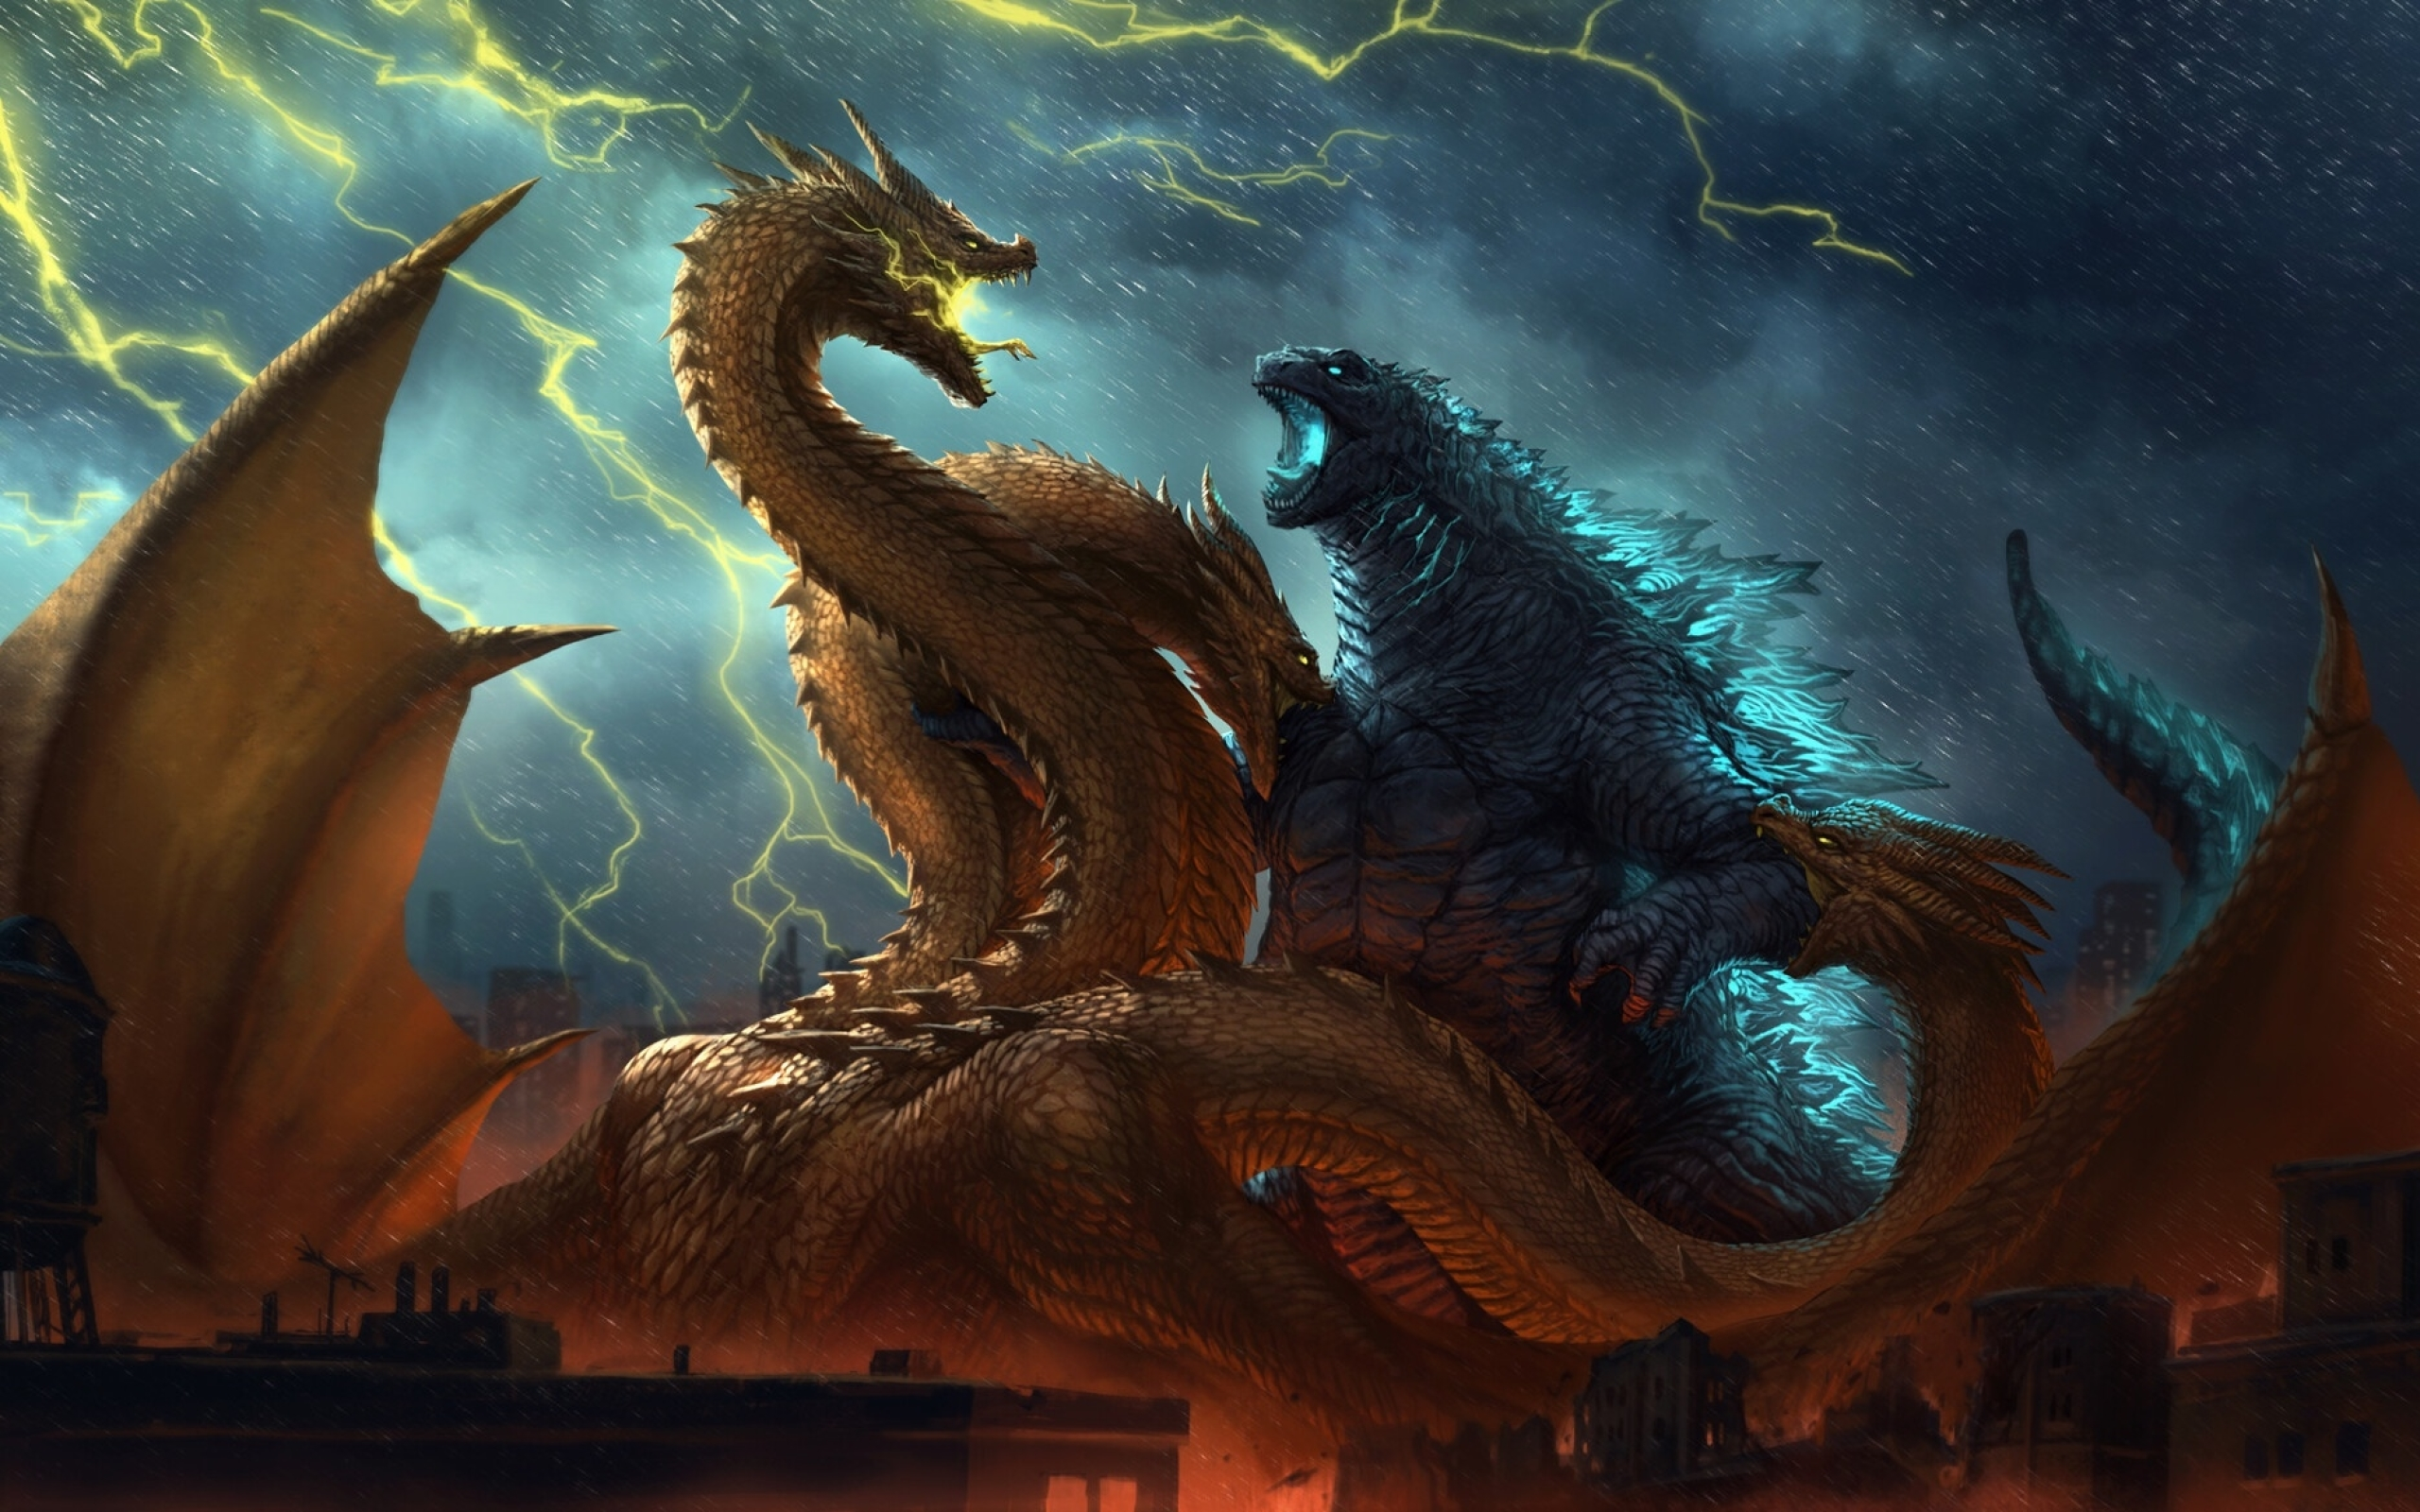 2560x1600 Godzilla vs King Ghidorah King of the Monsters 2560x1600 2560x1600